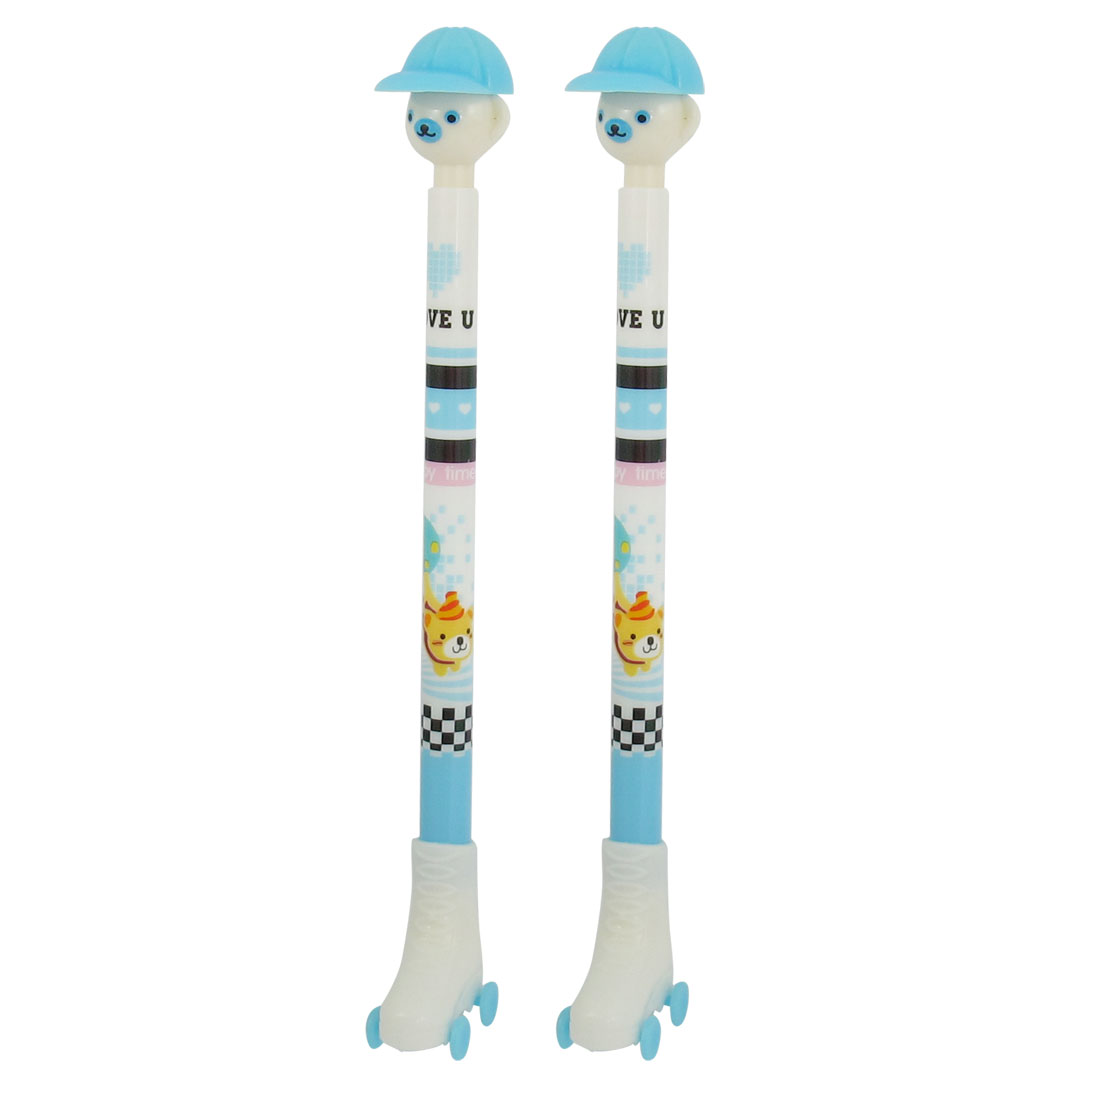 2 Pcs Blue White Plastic Ice Skates Design Self Lock Ball Point Pen